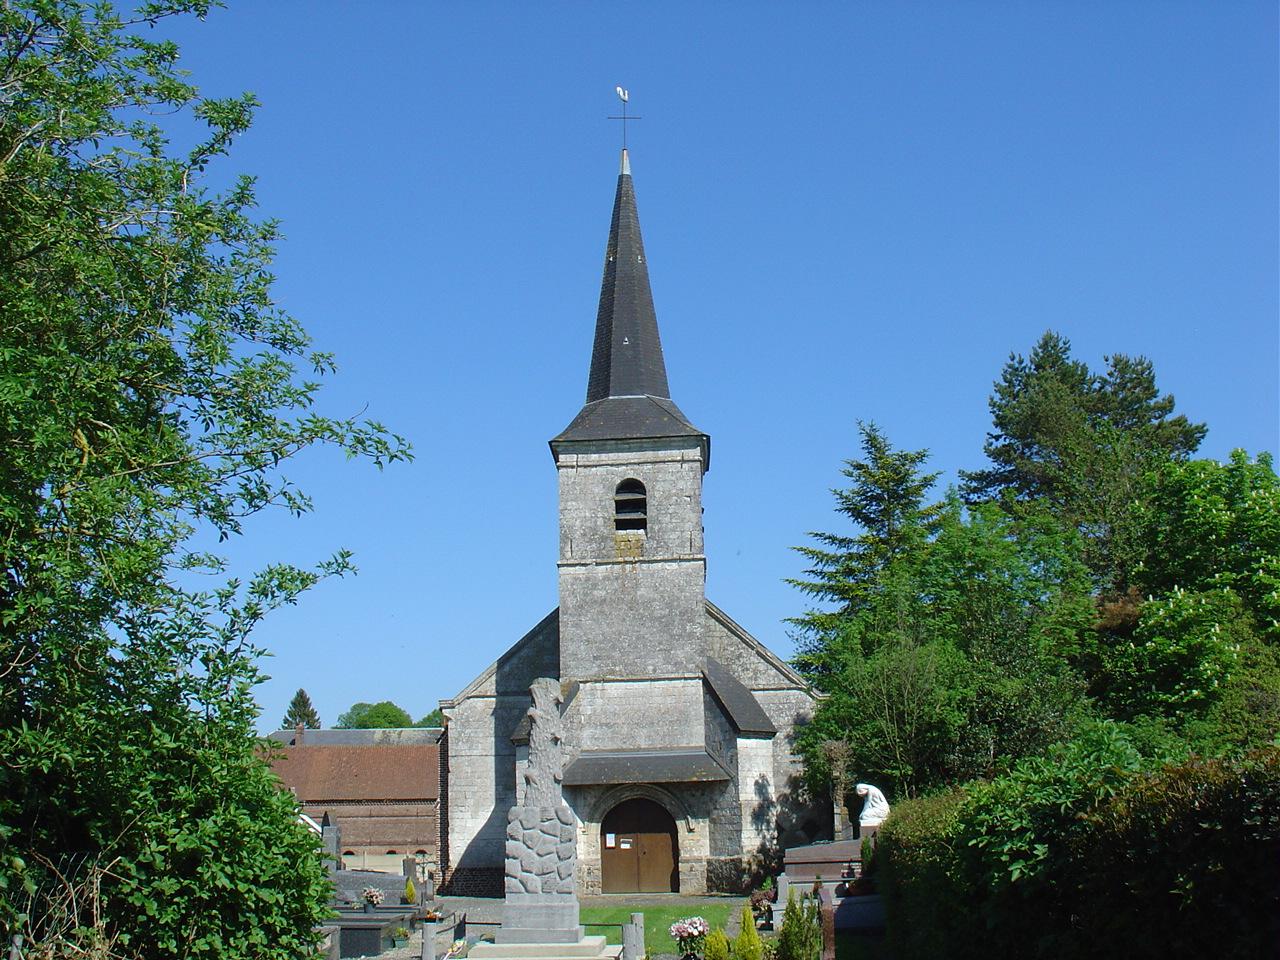 Herlin-le-Sec